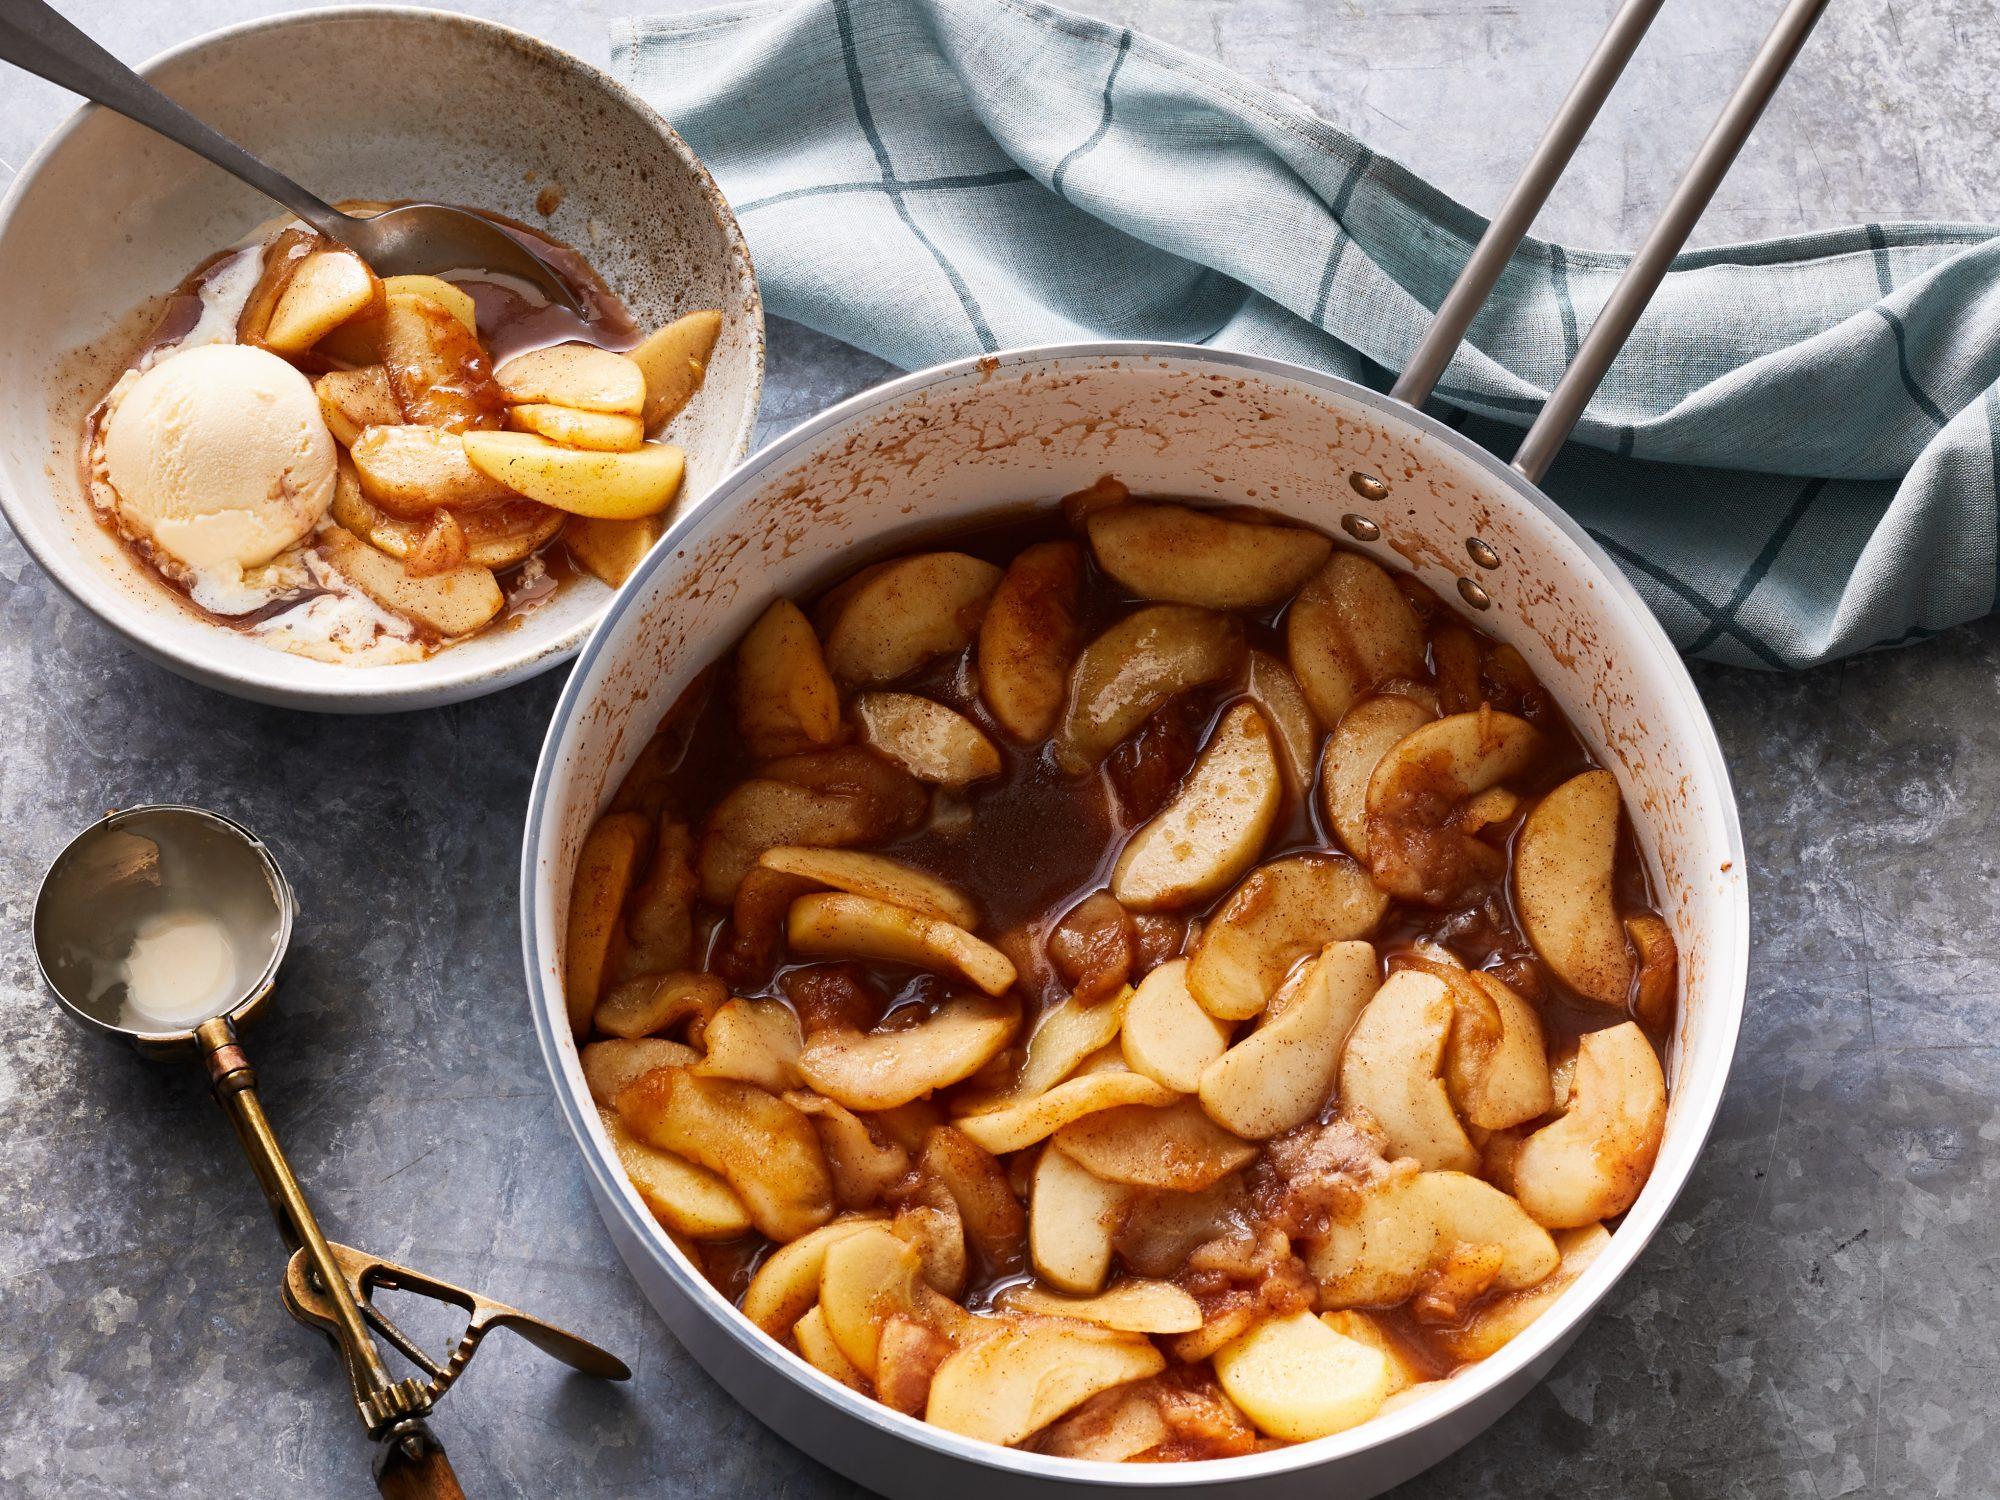 mr - Warm Cinnamon Apples reshoot